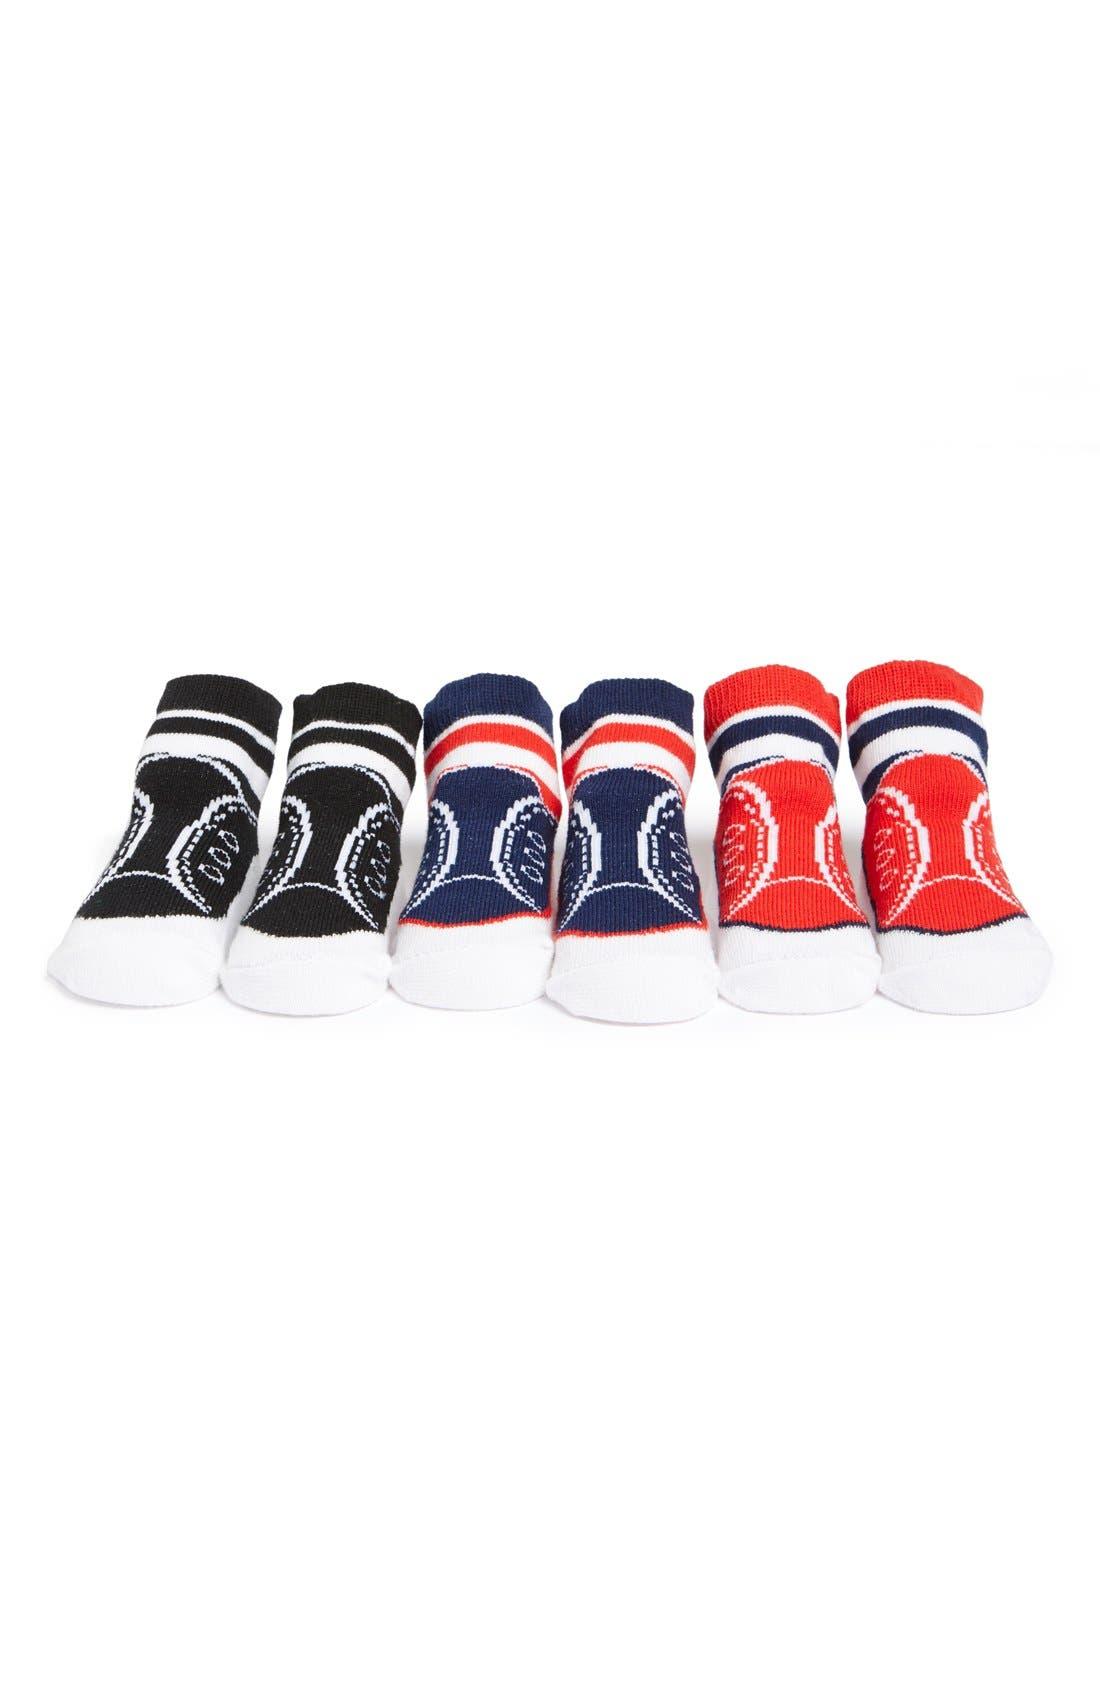 Main Image - Mud Pie 'Sport' Socks (3-Pack) (Baby)